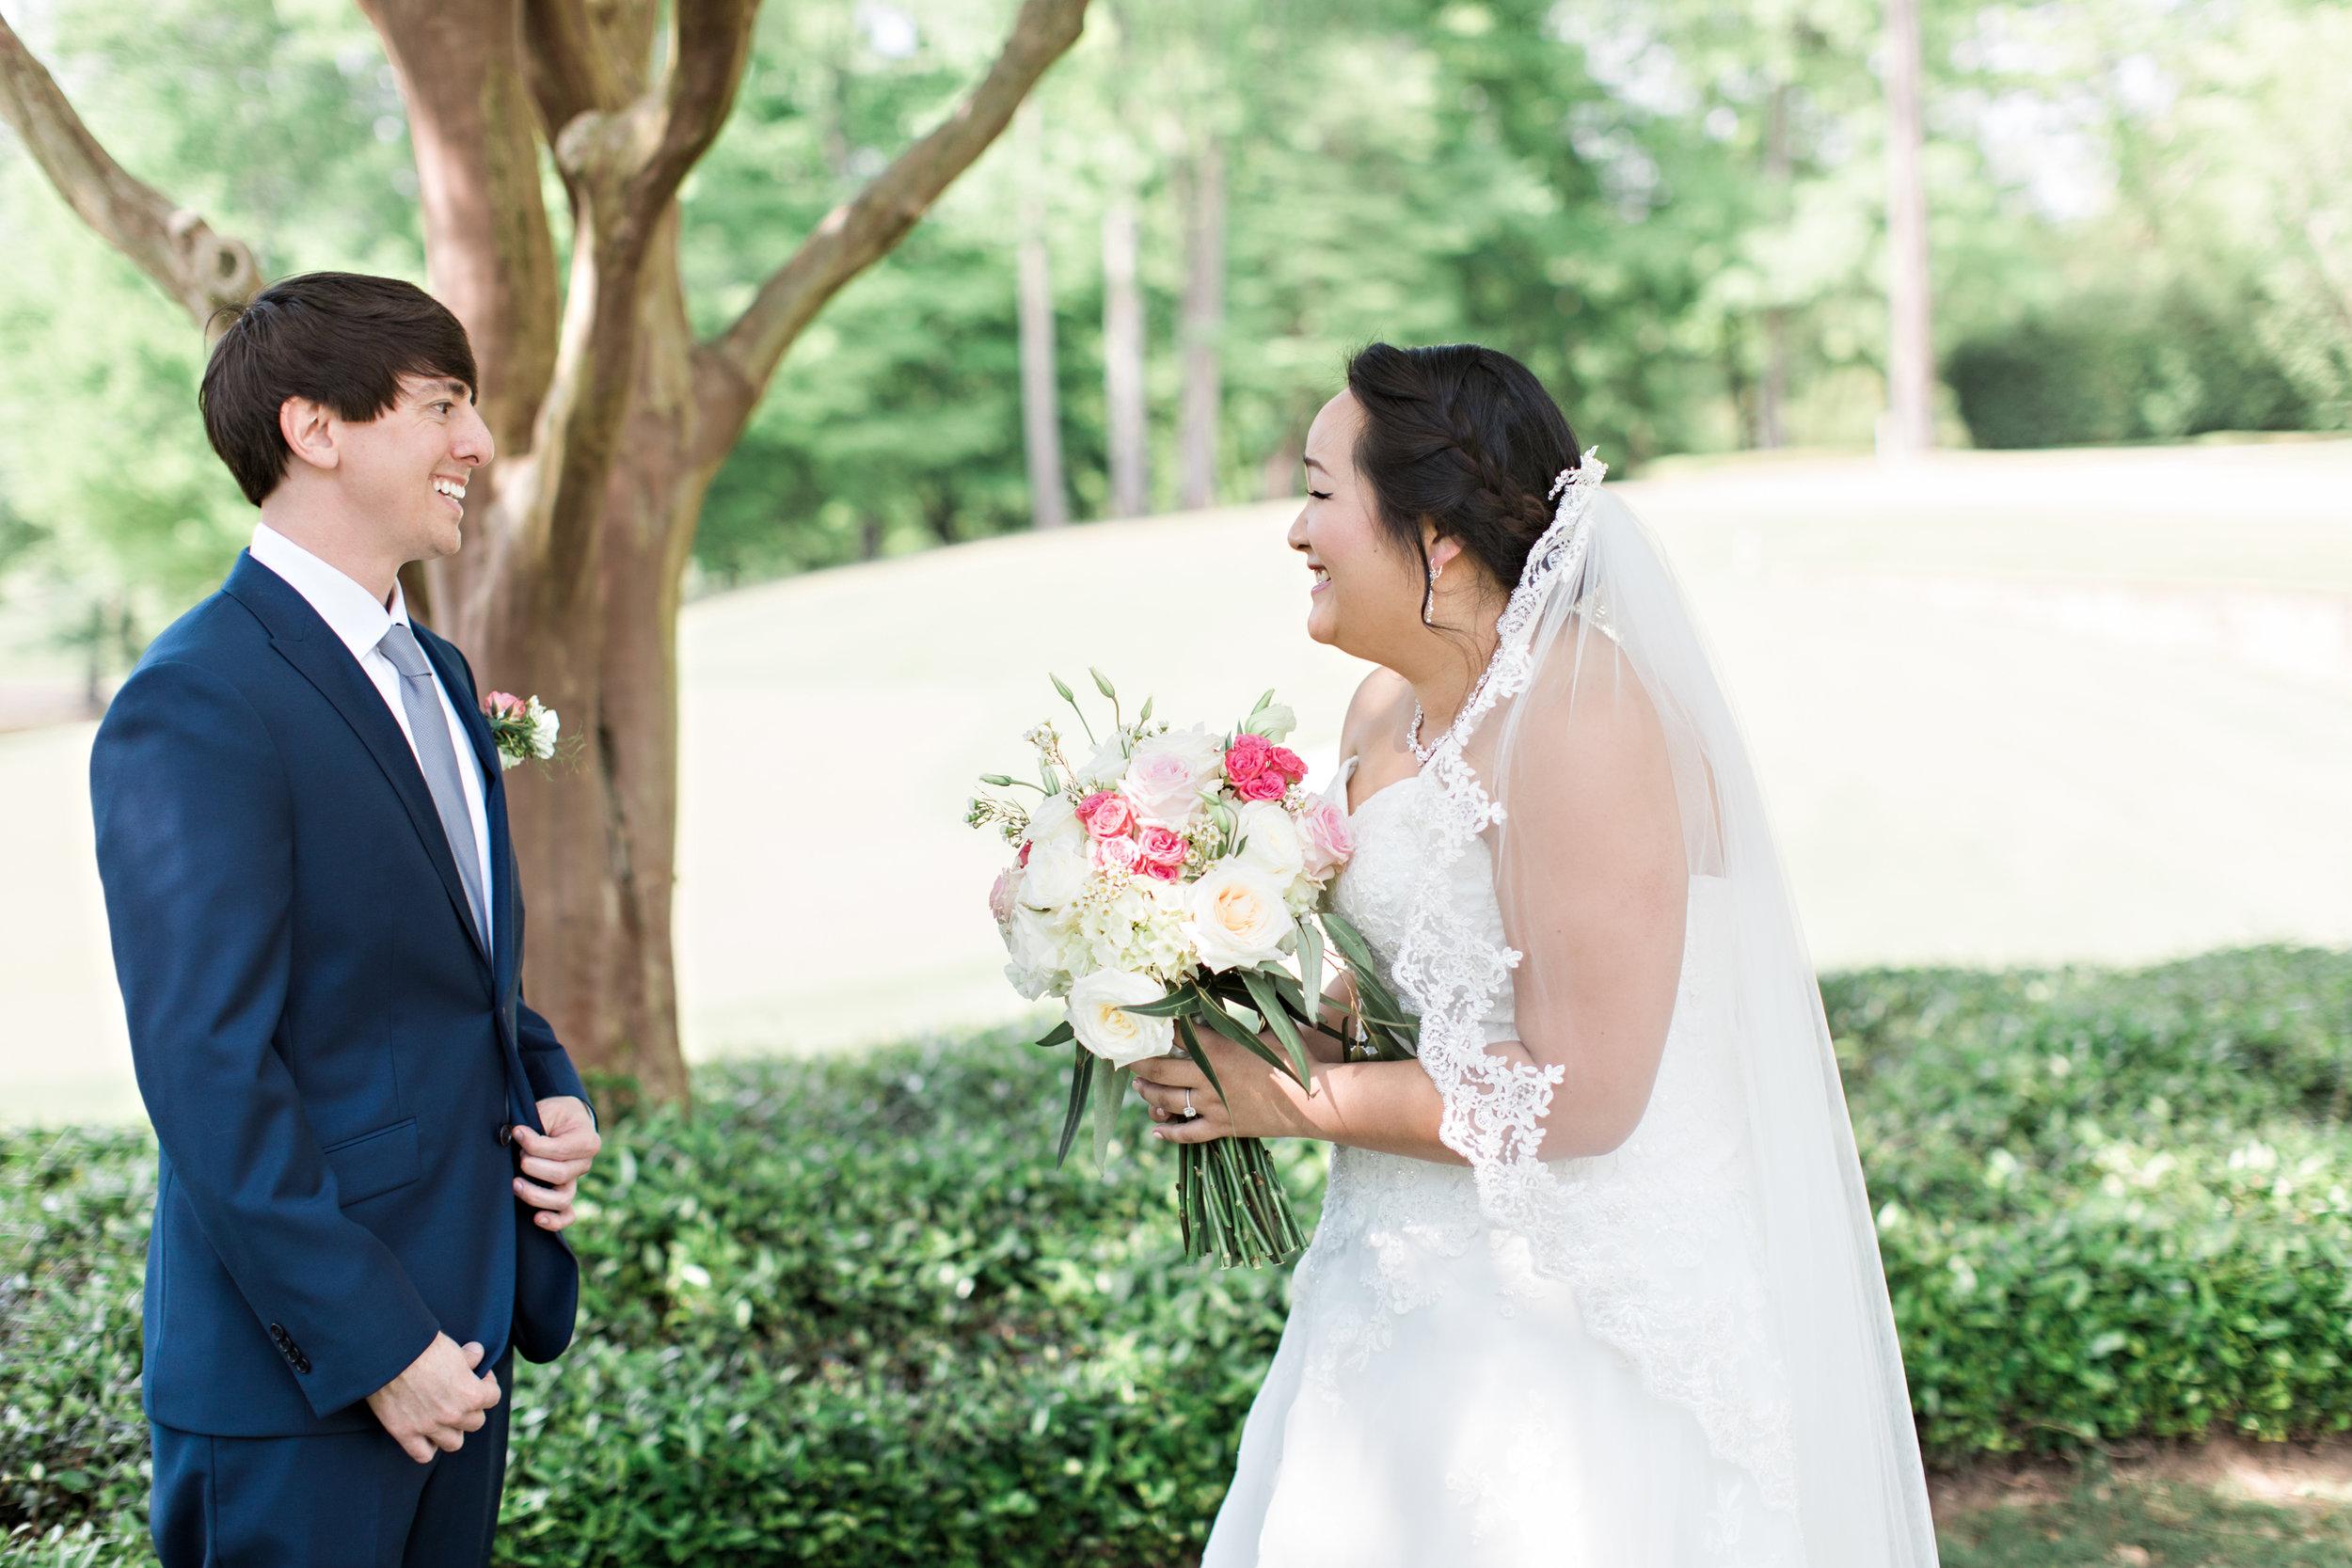 Ni ck-Drollette-Photography-Auburn-Alabama-Weddings-Sylvia-Kevin-116.jpg